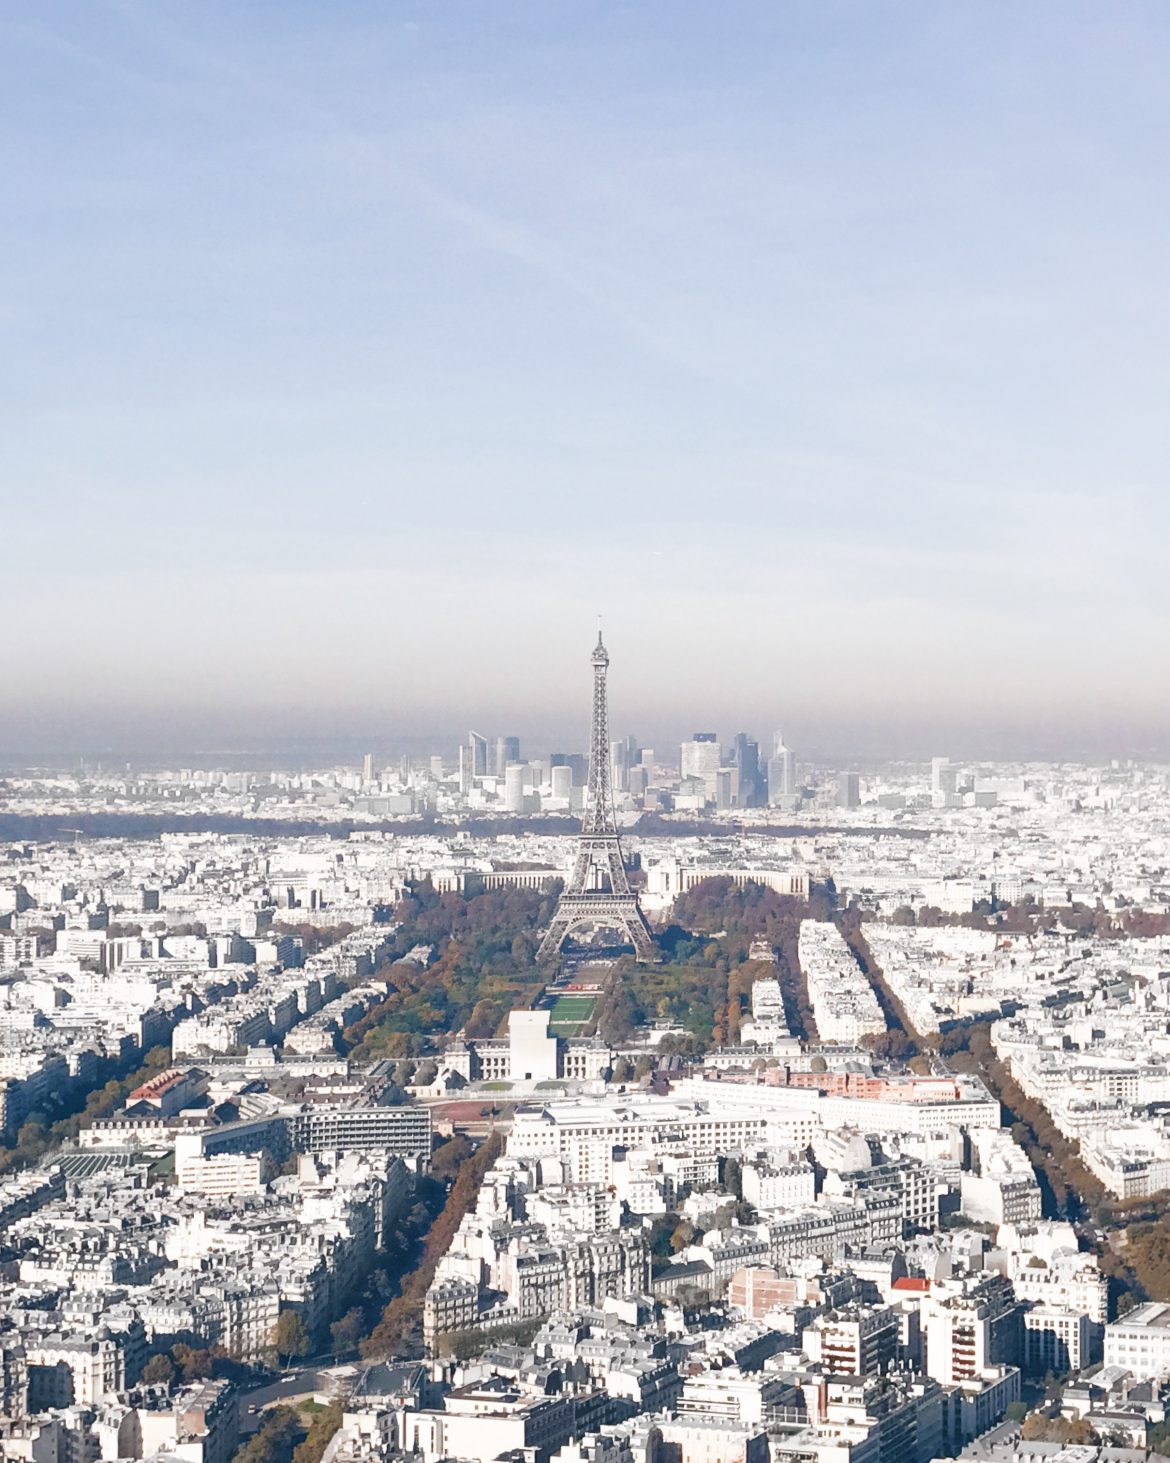 Vista de Paris e da Torre Eiffel - Ciel de Paris - Kezia Happuck